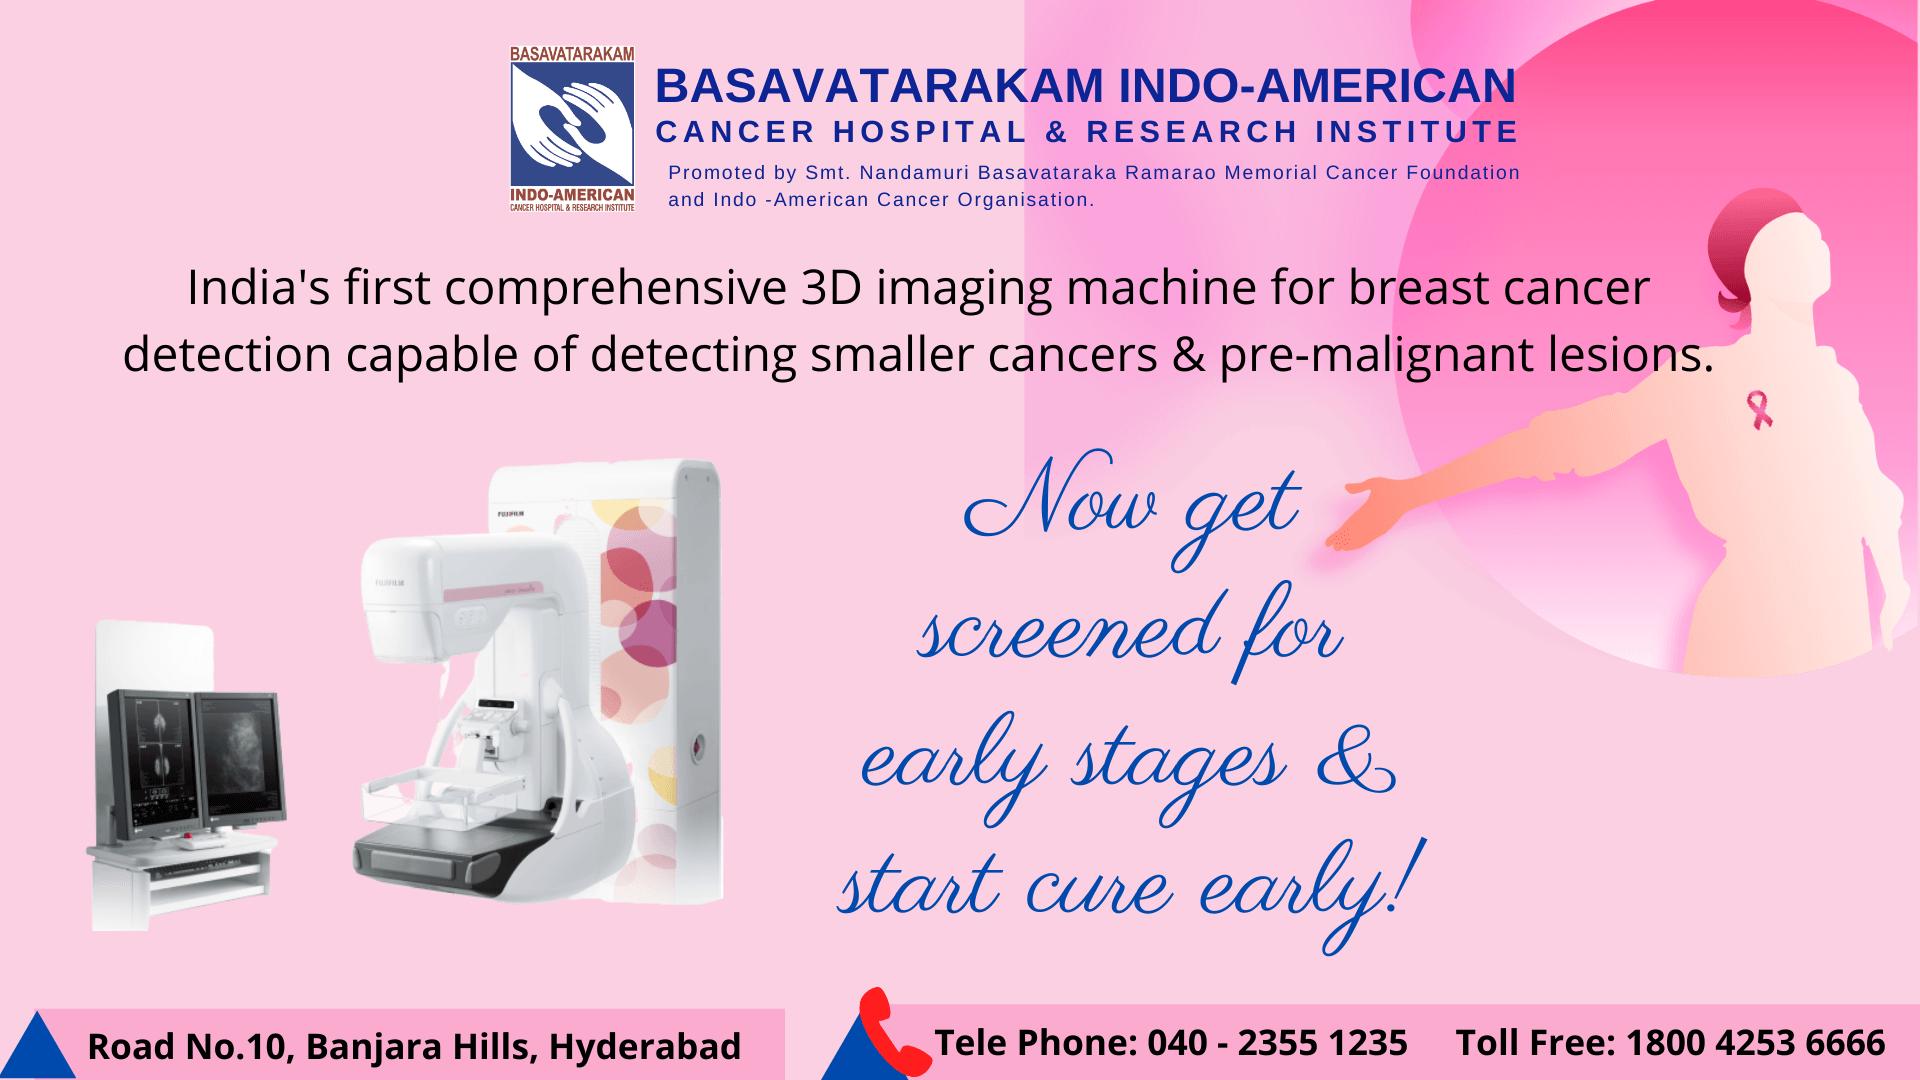 3D Mammography Basavatarakam Cancer Hospital Best Cancer Hospital Hyderabad India